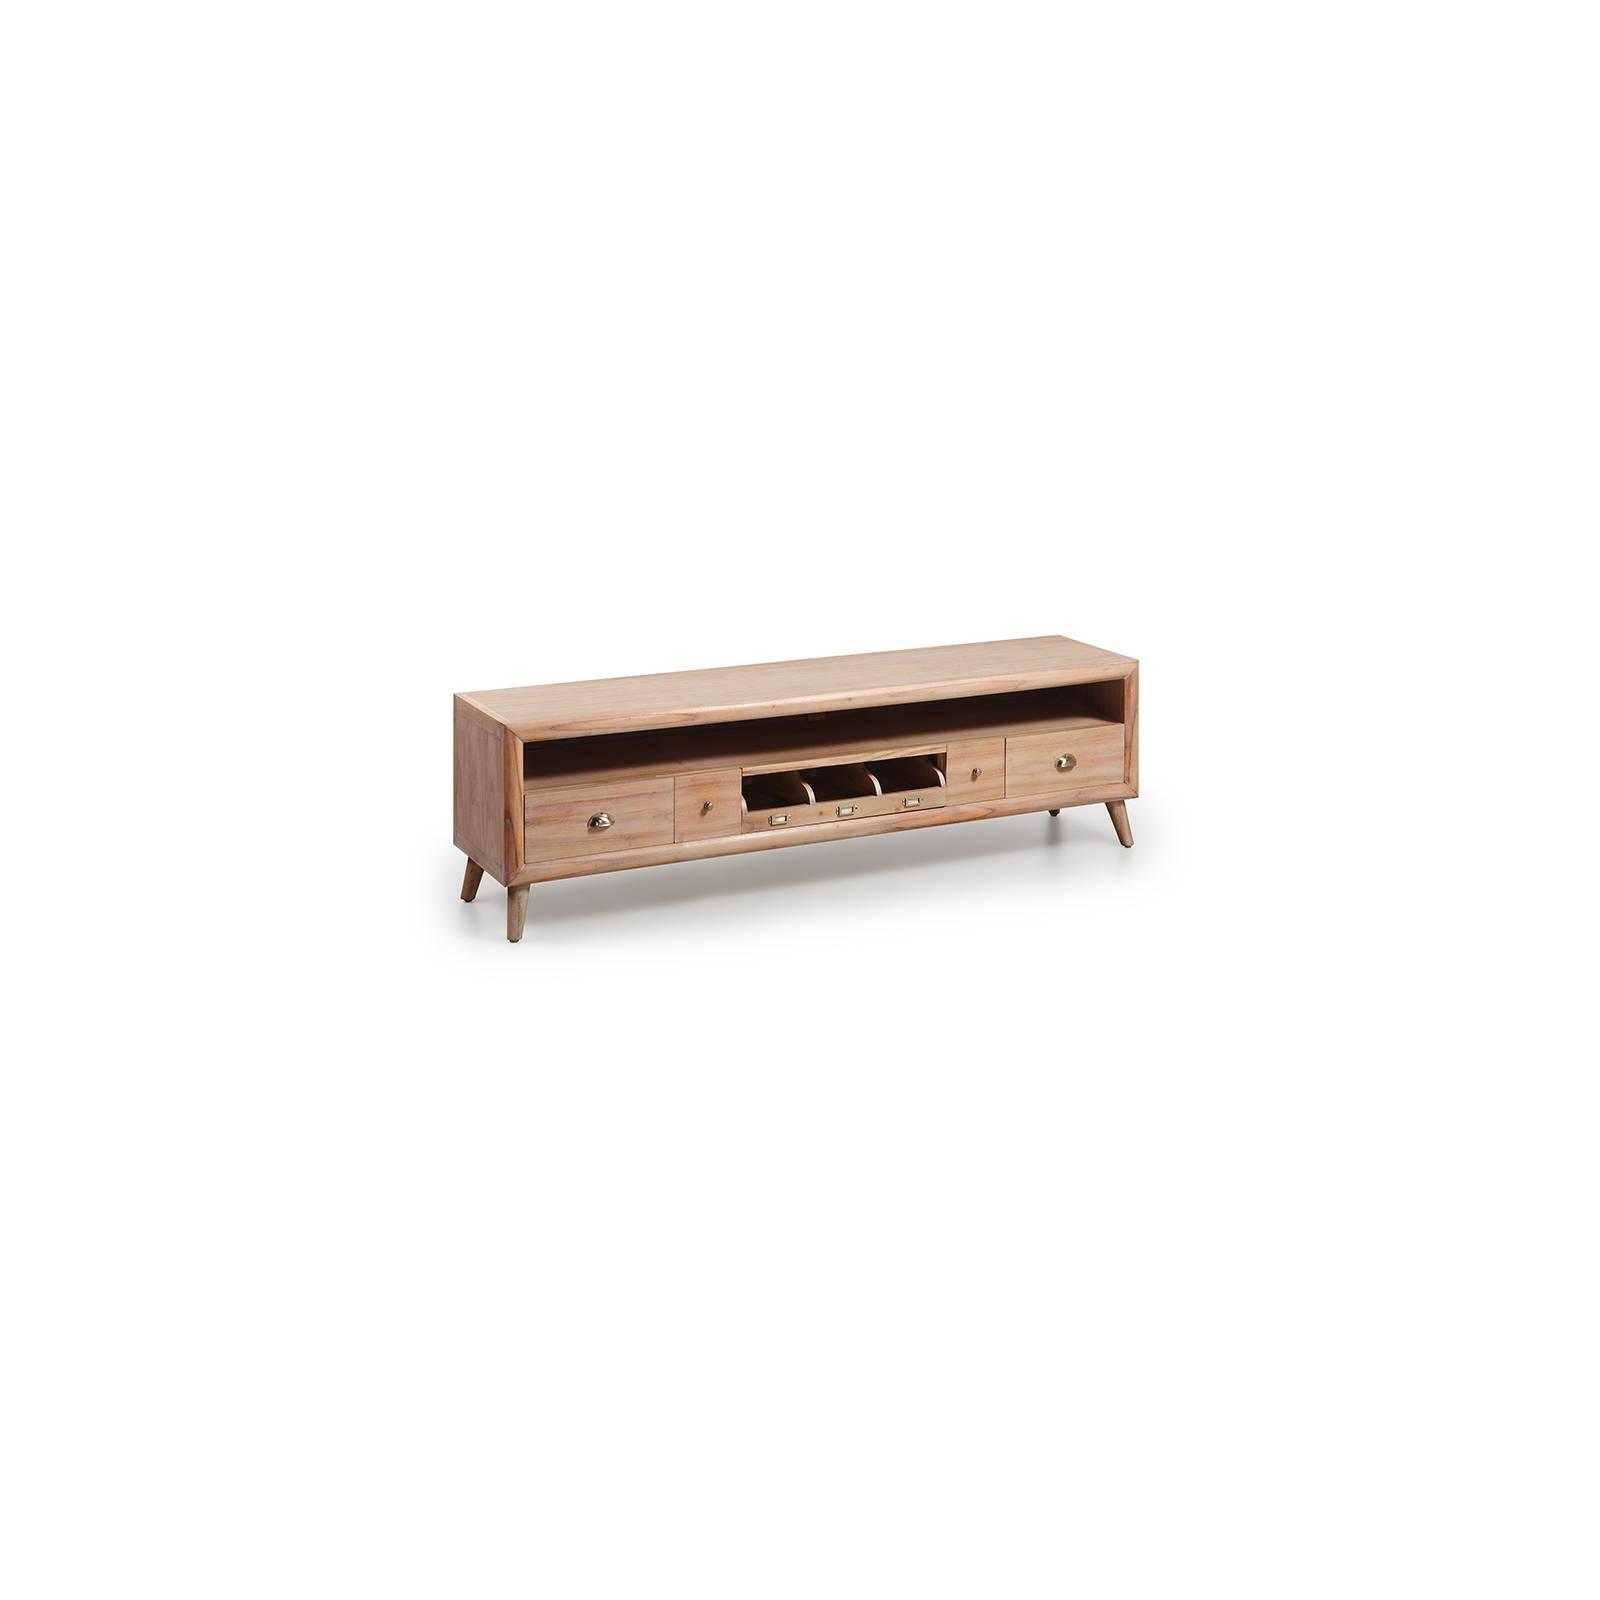 Meuble Tv GM Oslo Mindy - meuble bois massif